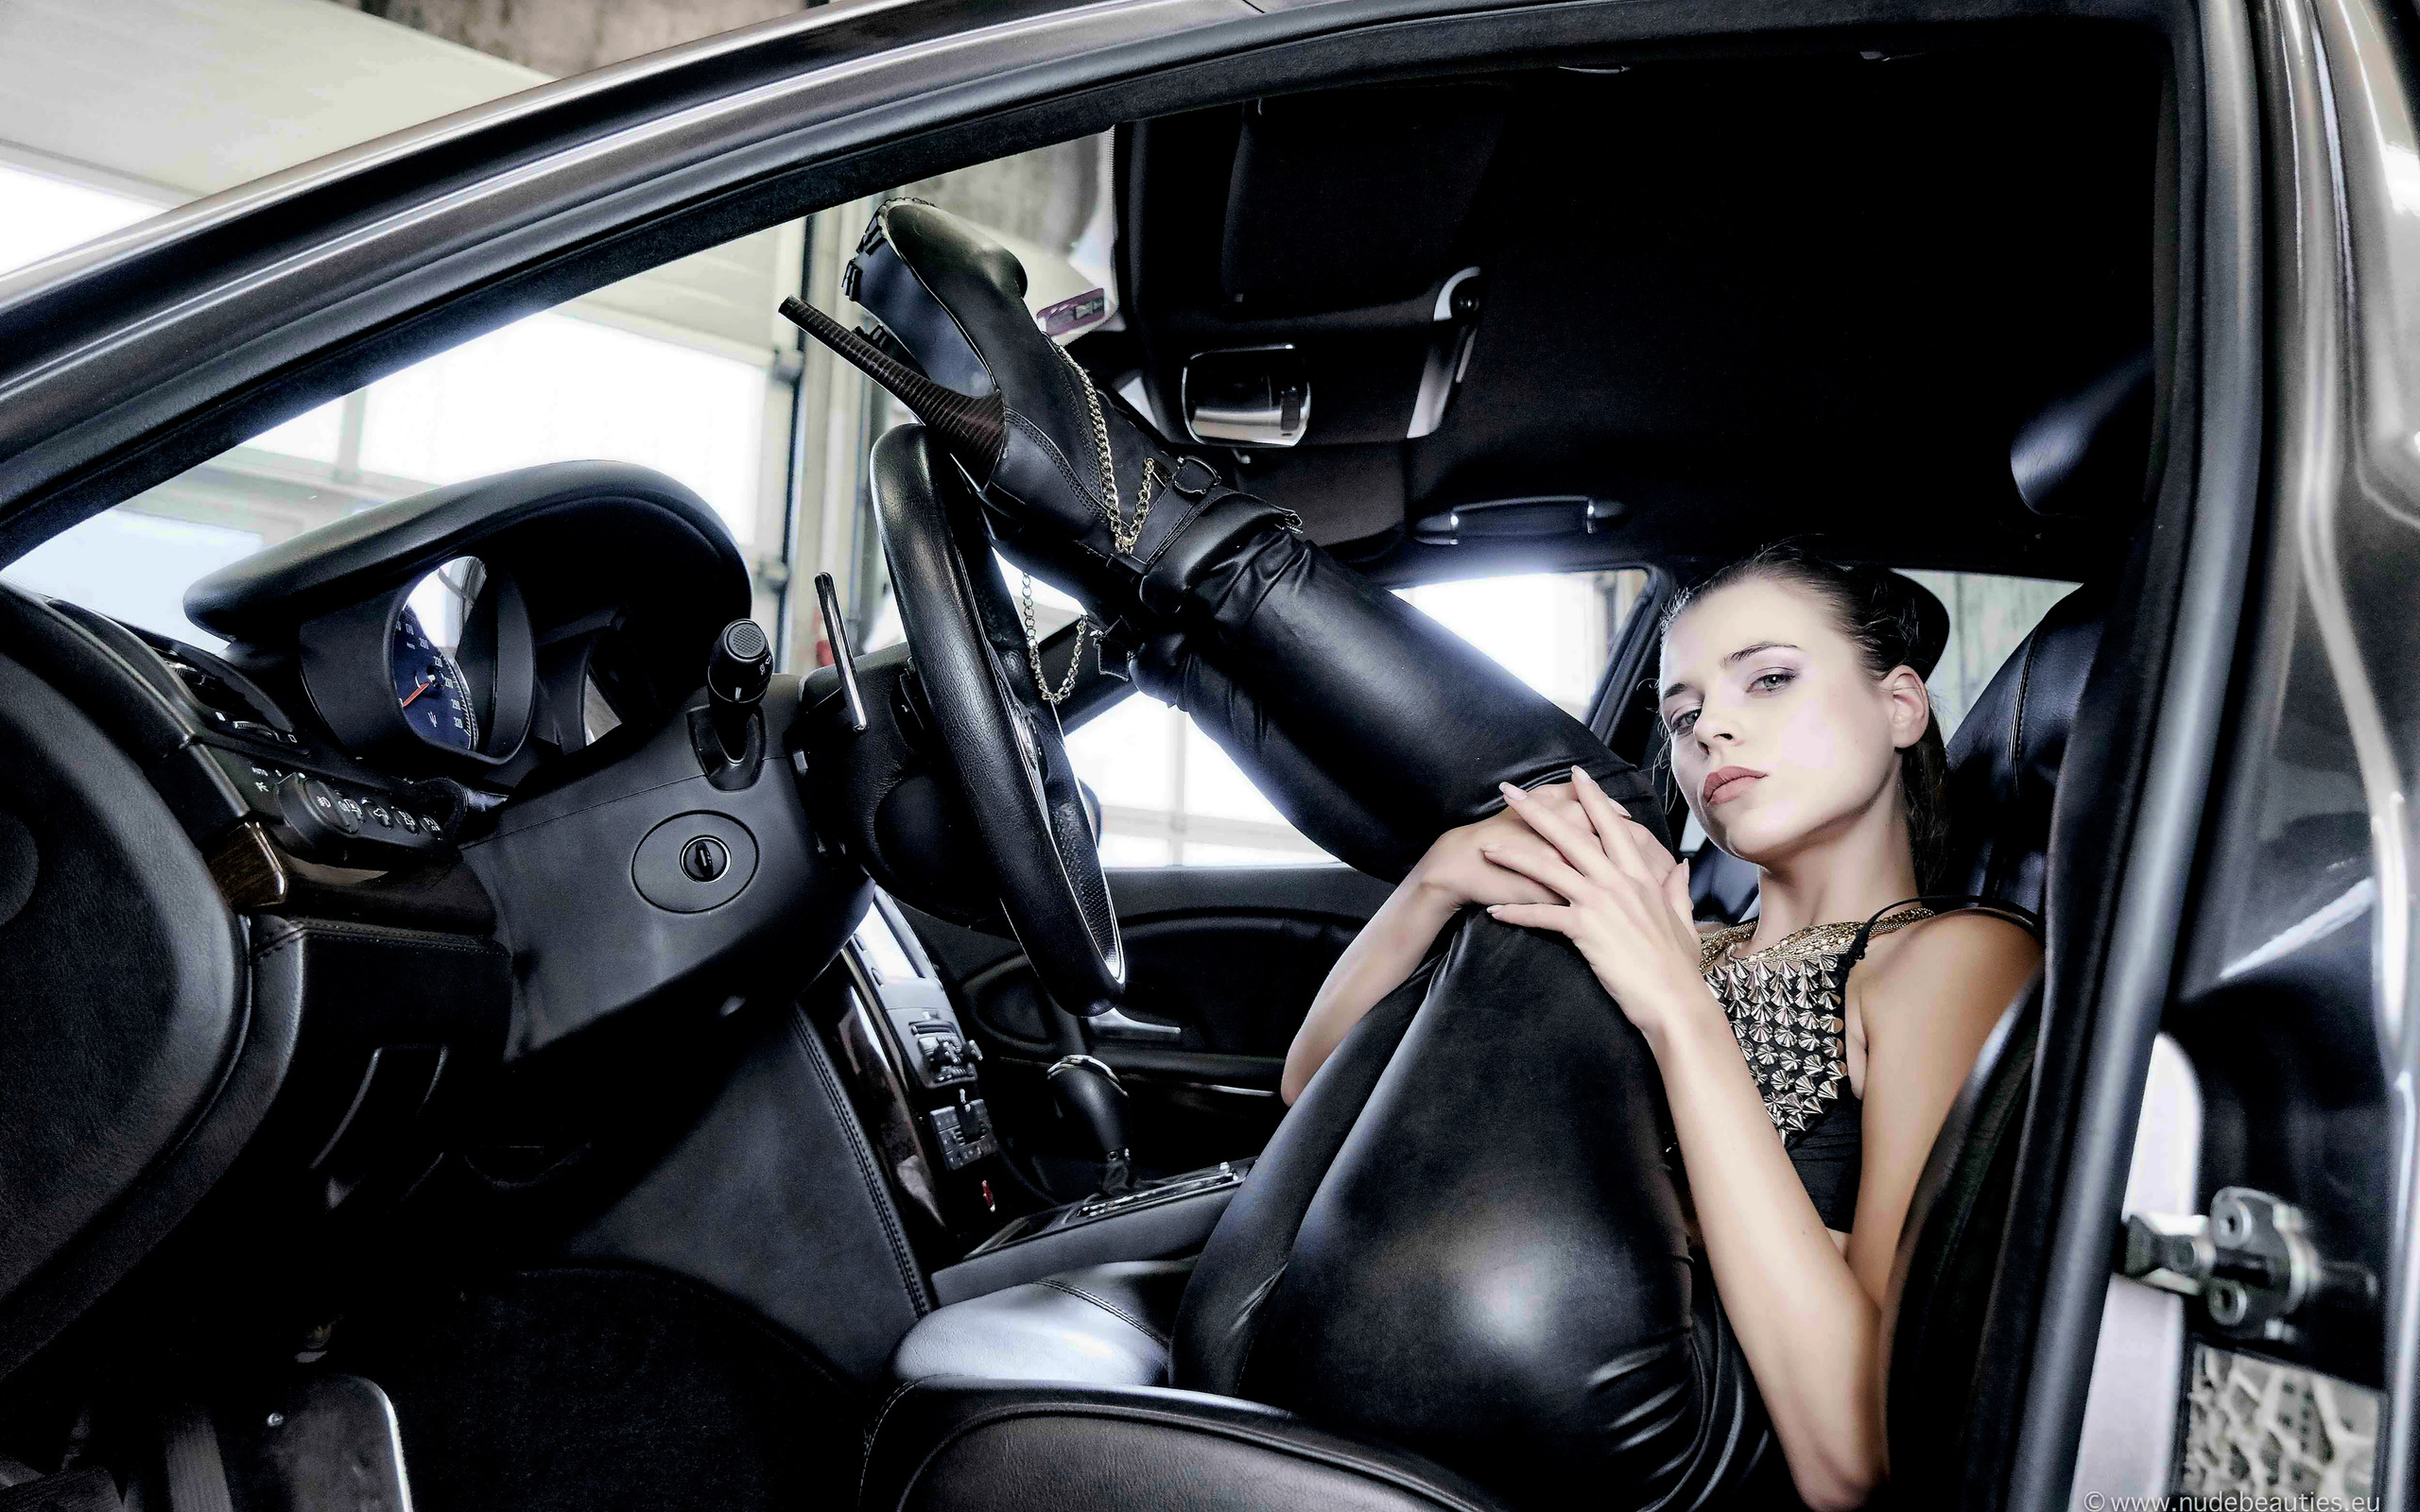 aleksa slusarchi, valeria a, model, brunette, leather pants, high heels, car, maserati, maserati